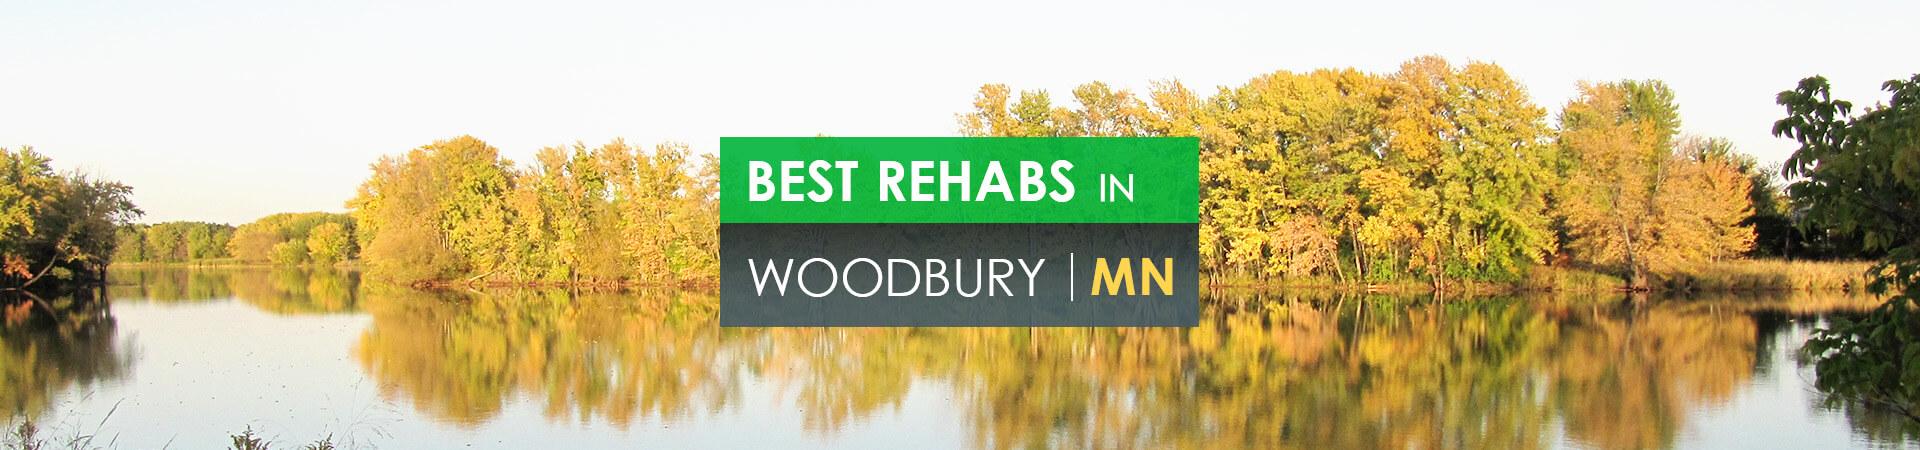 Best rehabs in Woodbury, MN